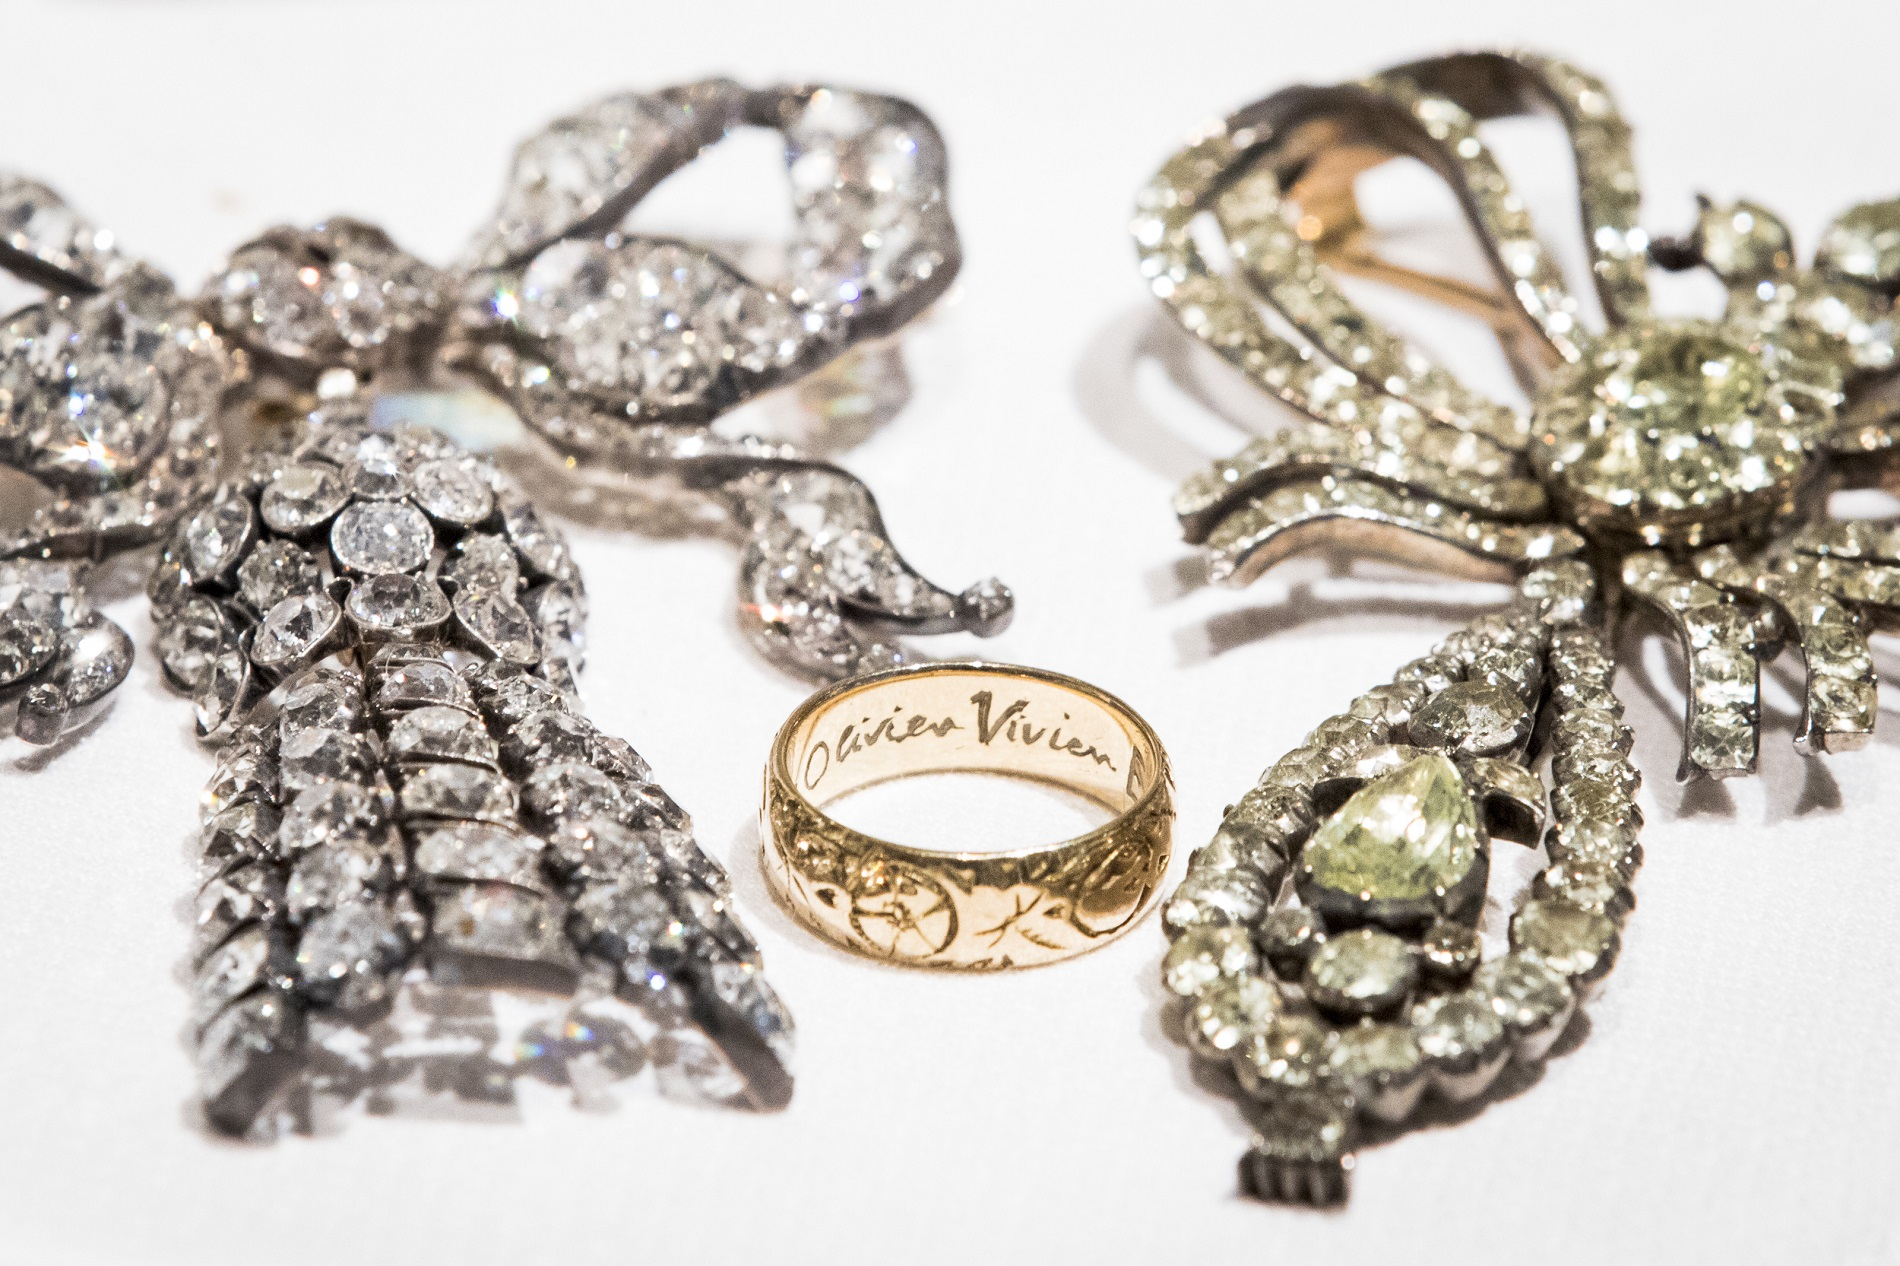 gold-ring-18th-century-chrysoberyl-devant-de-corsage-and-mid-19th-century- diamond-bow-brooch.jpg